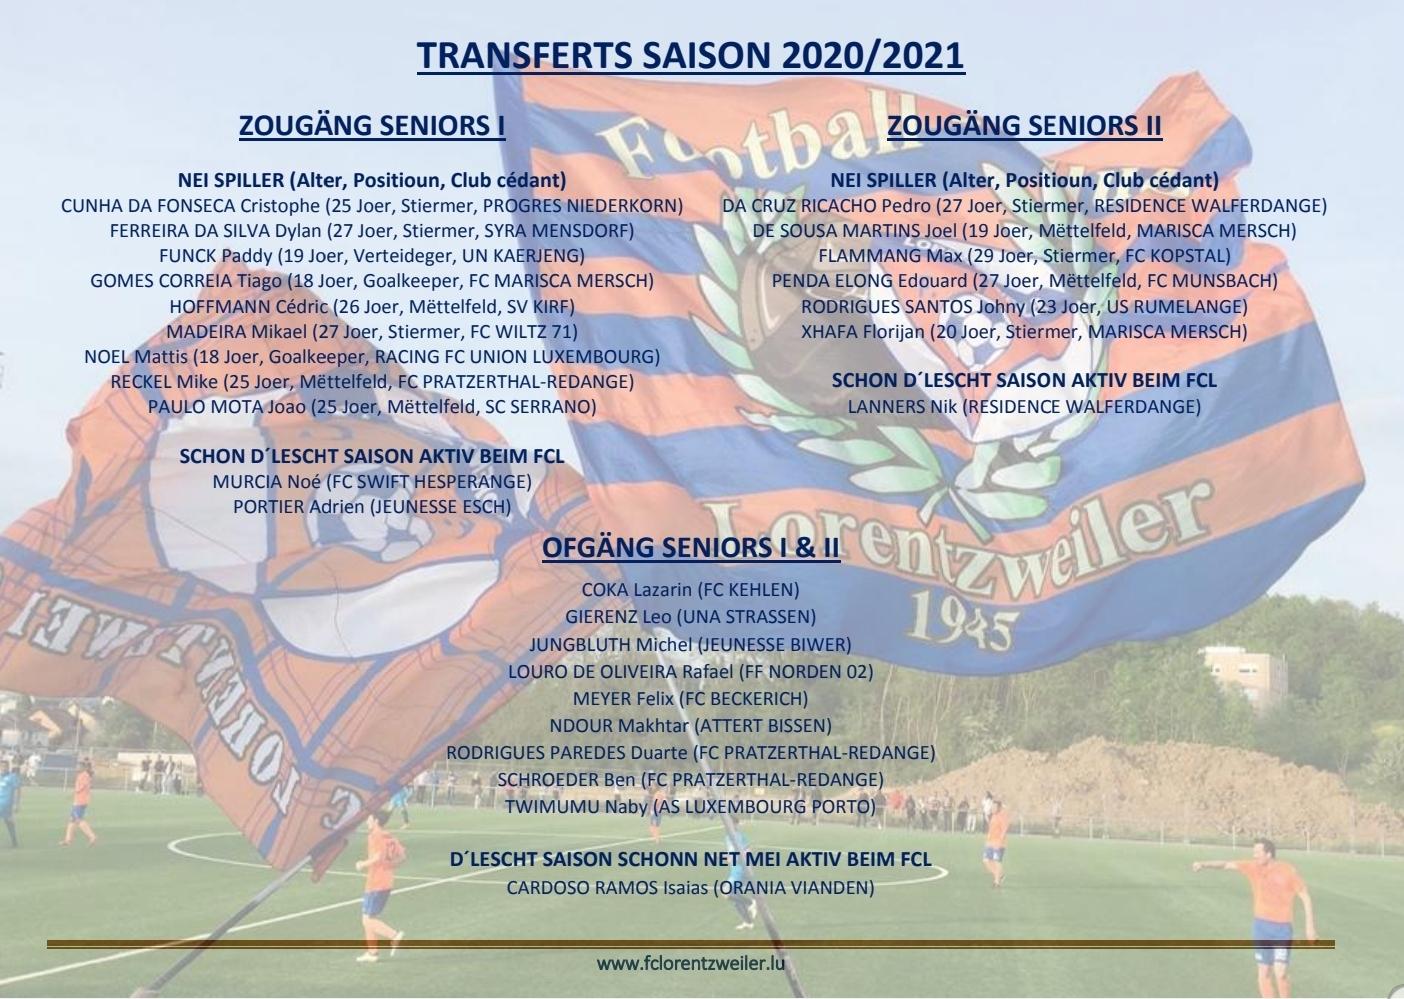 Transferts Seniors - Saison 2020/2021